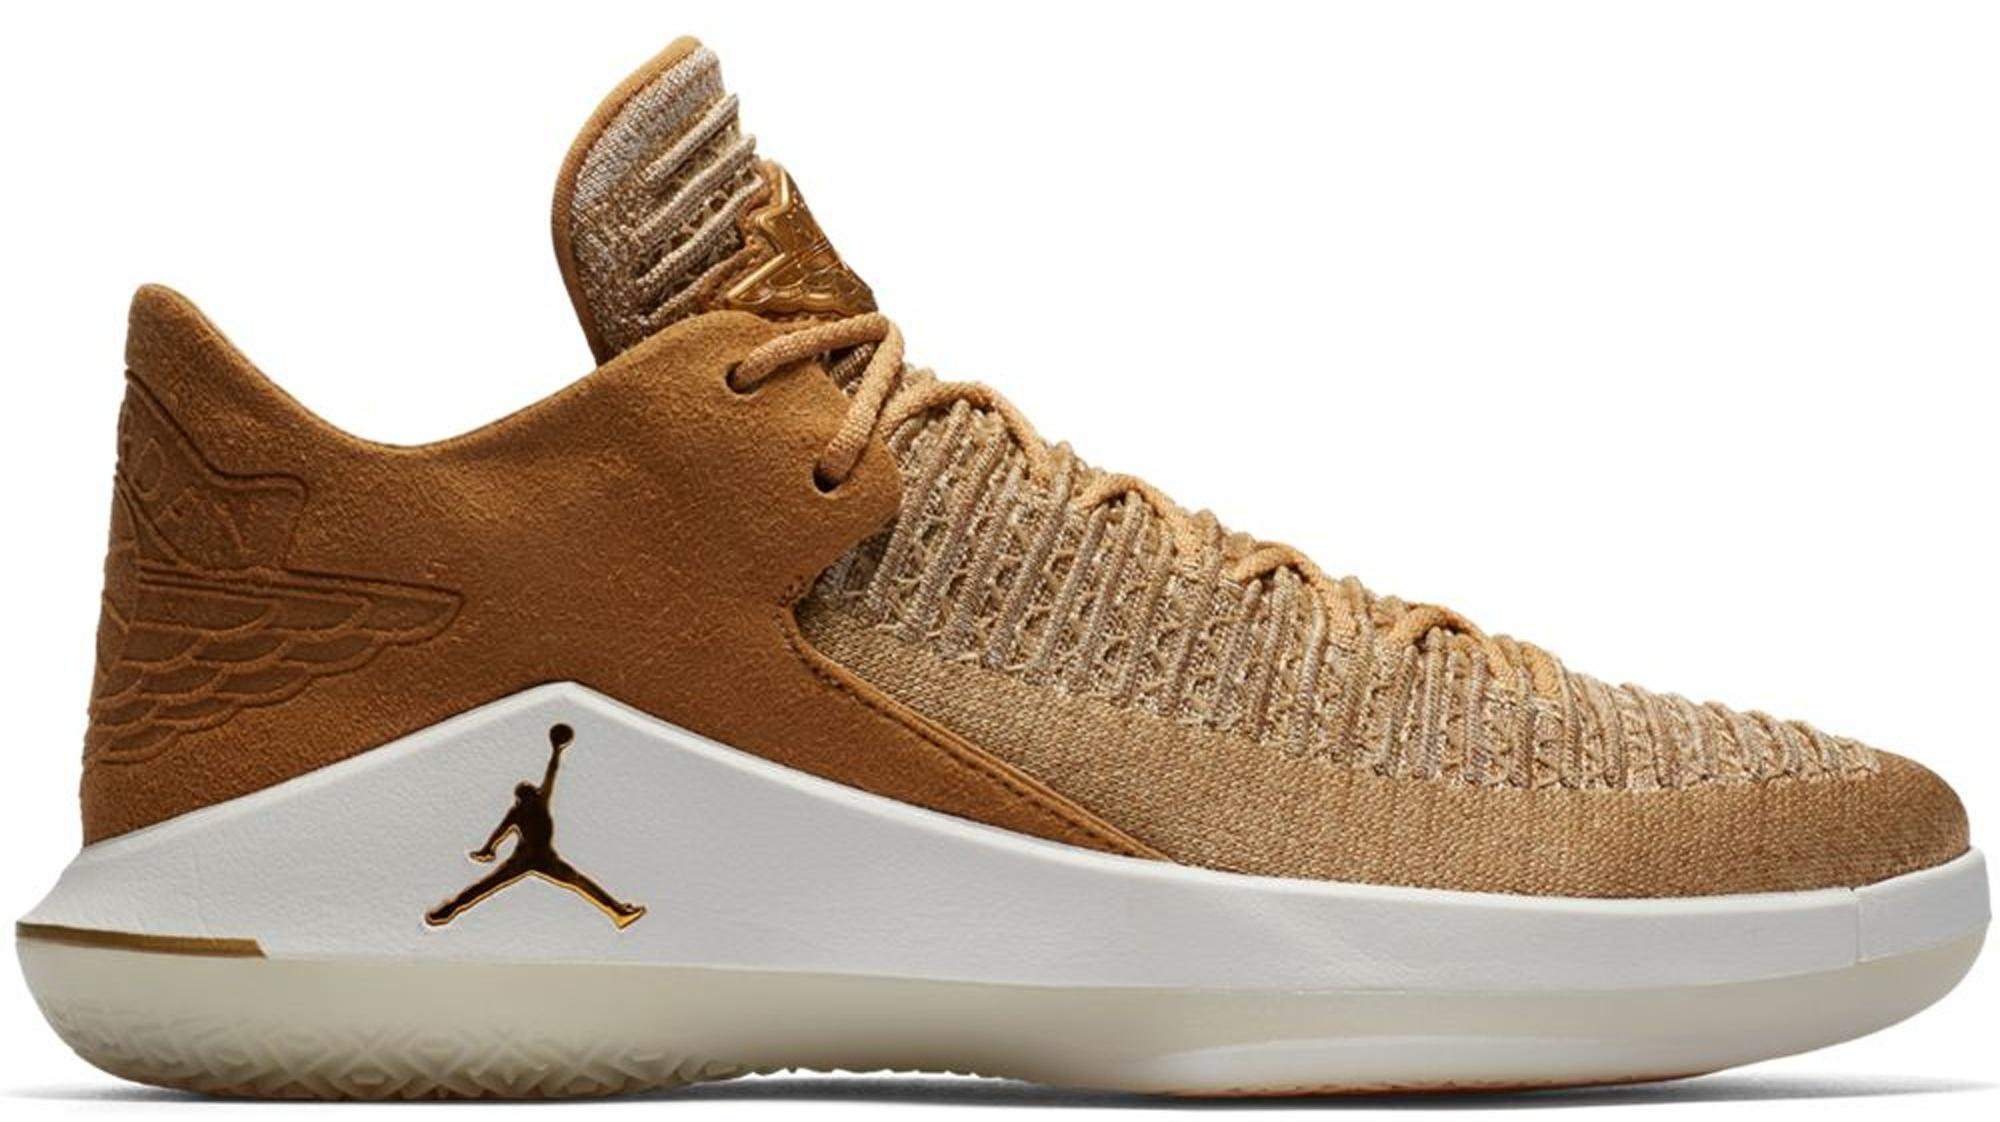 373ec3b6 Nike - Metallic Xxxii Low Golden Harvest for Men - Lyst. View fullscreen